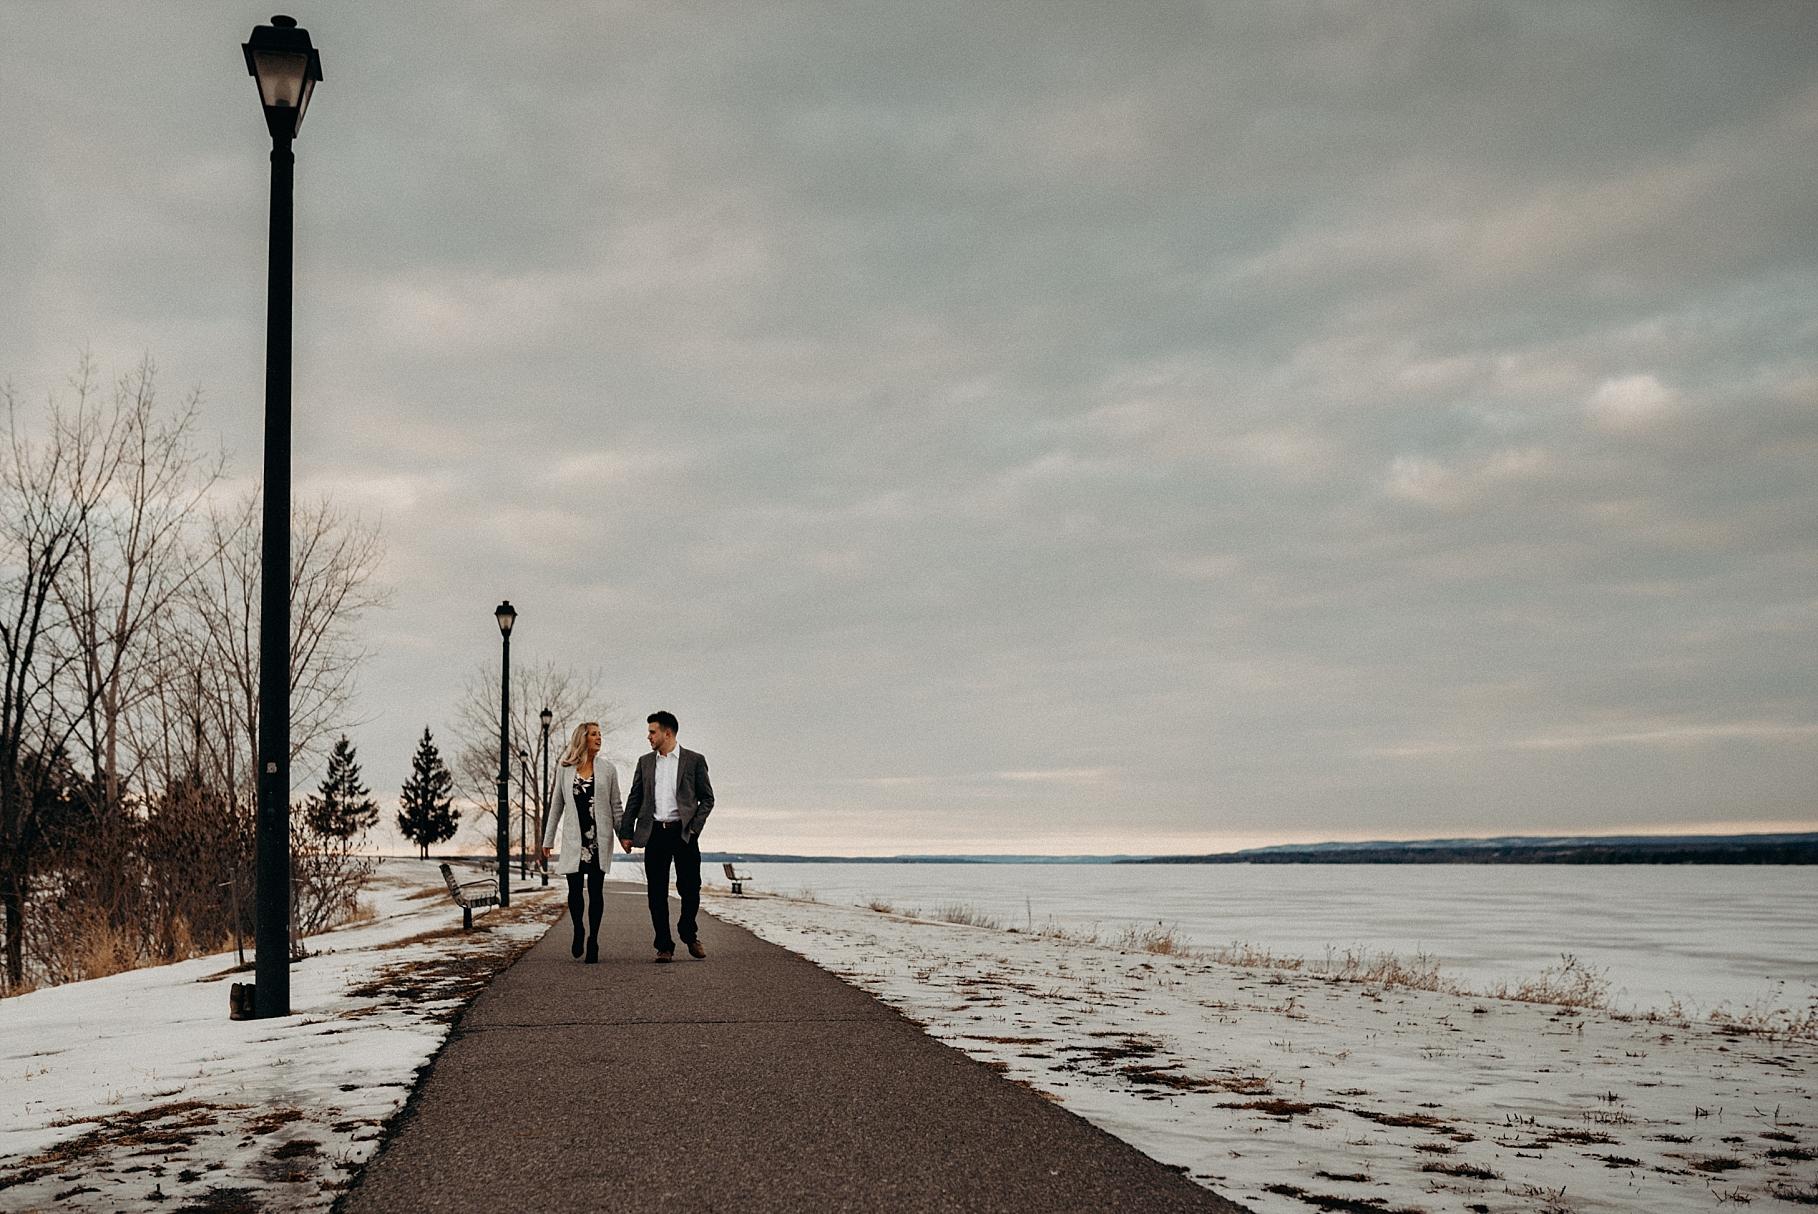 Mocha Tree Studios Ottawa Toronto Montreal Wedding and Engagement Photographer and Videographer Dark Moody Intimate Authentic Modern Romantic Cinematic Best Candid Nepean Sailing Club Andew Haydon Park 1